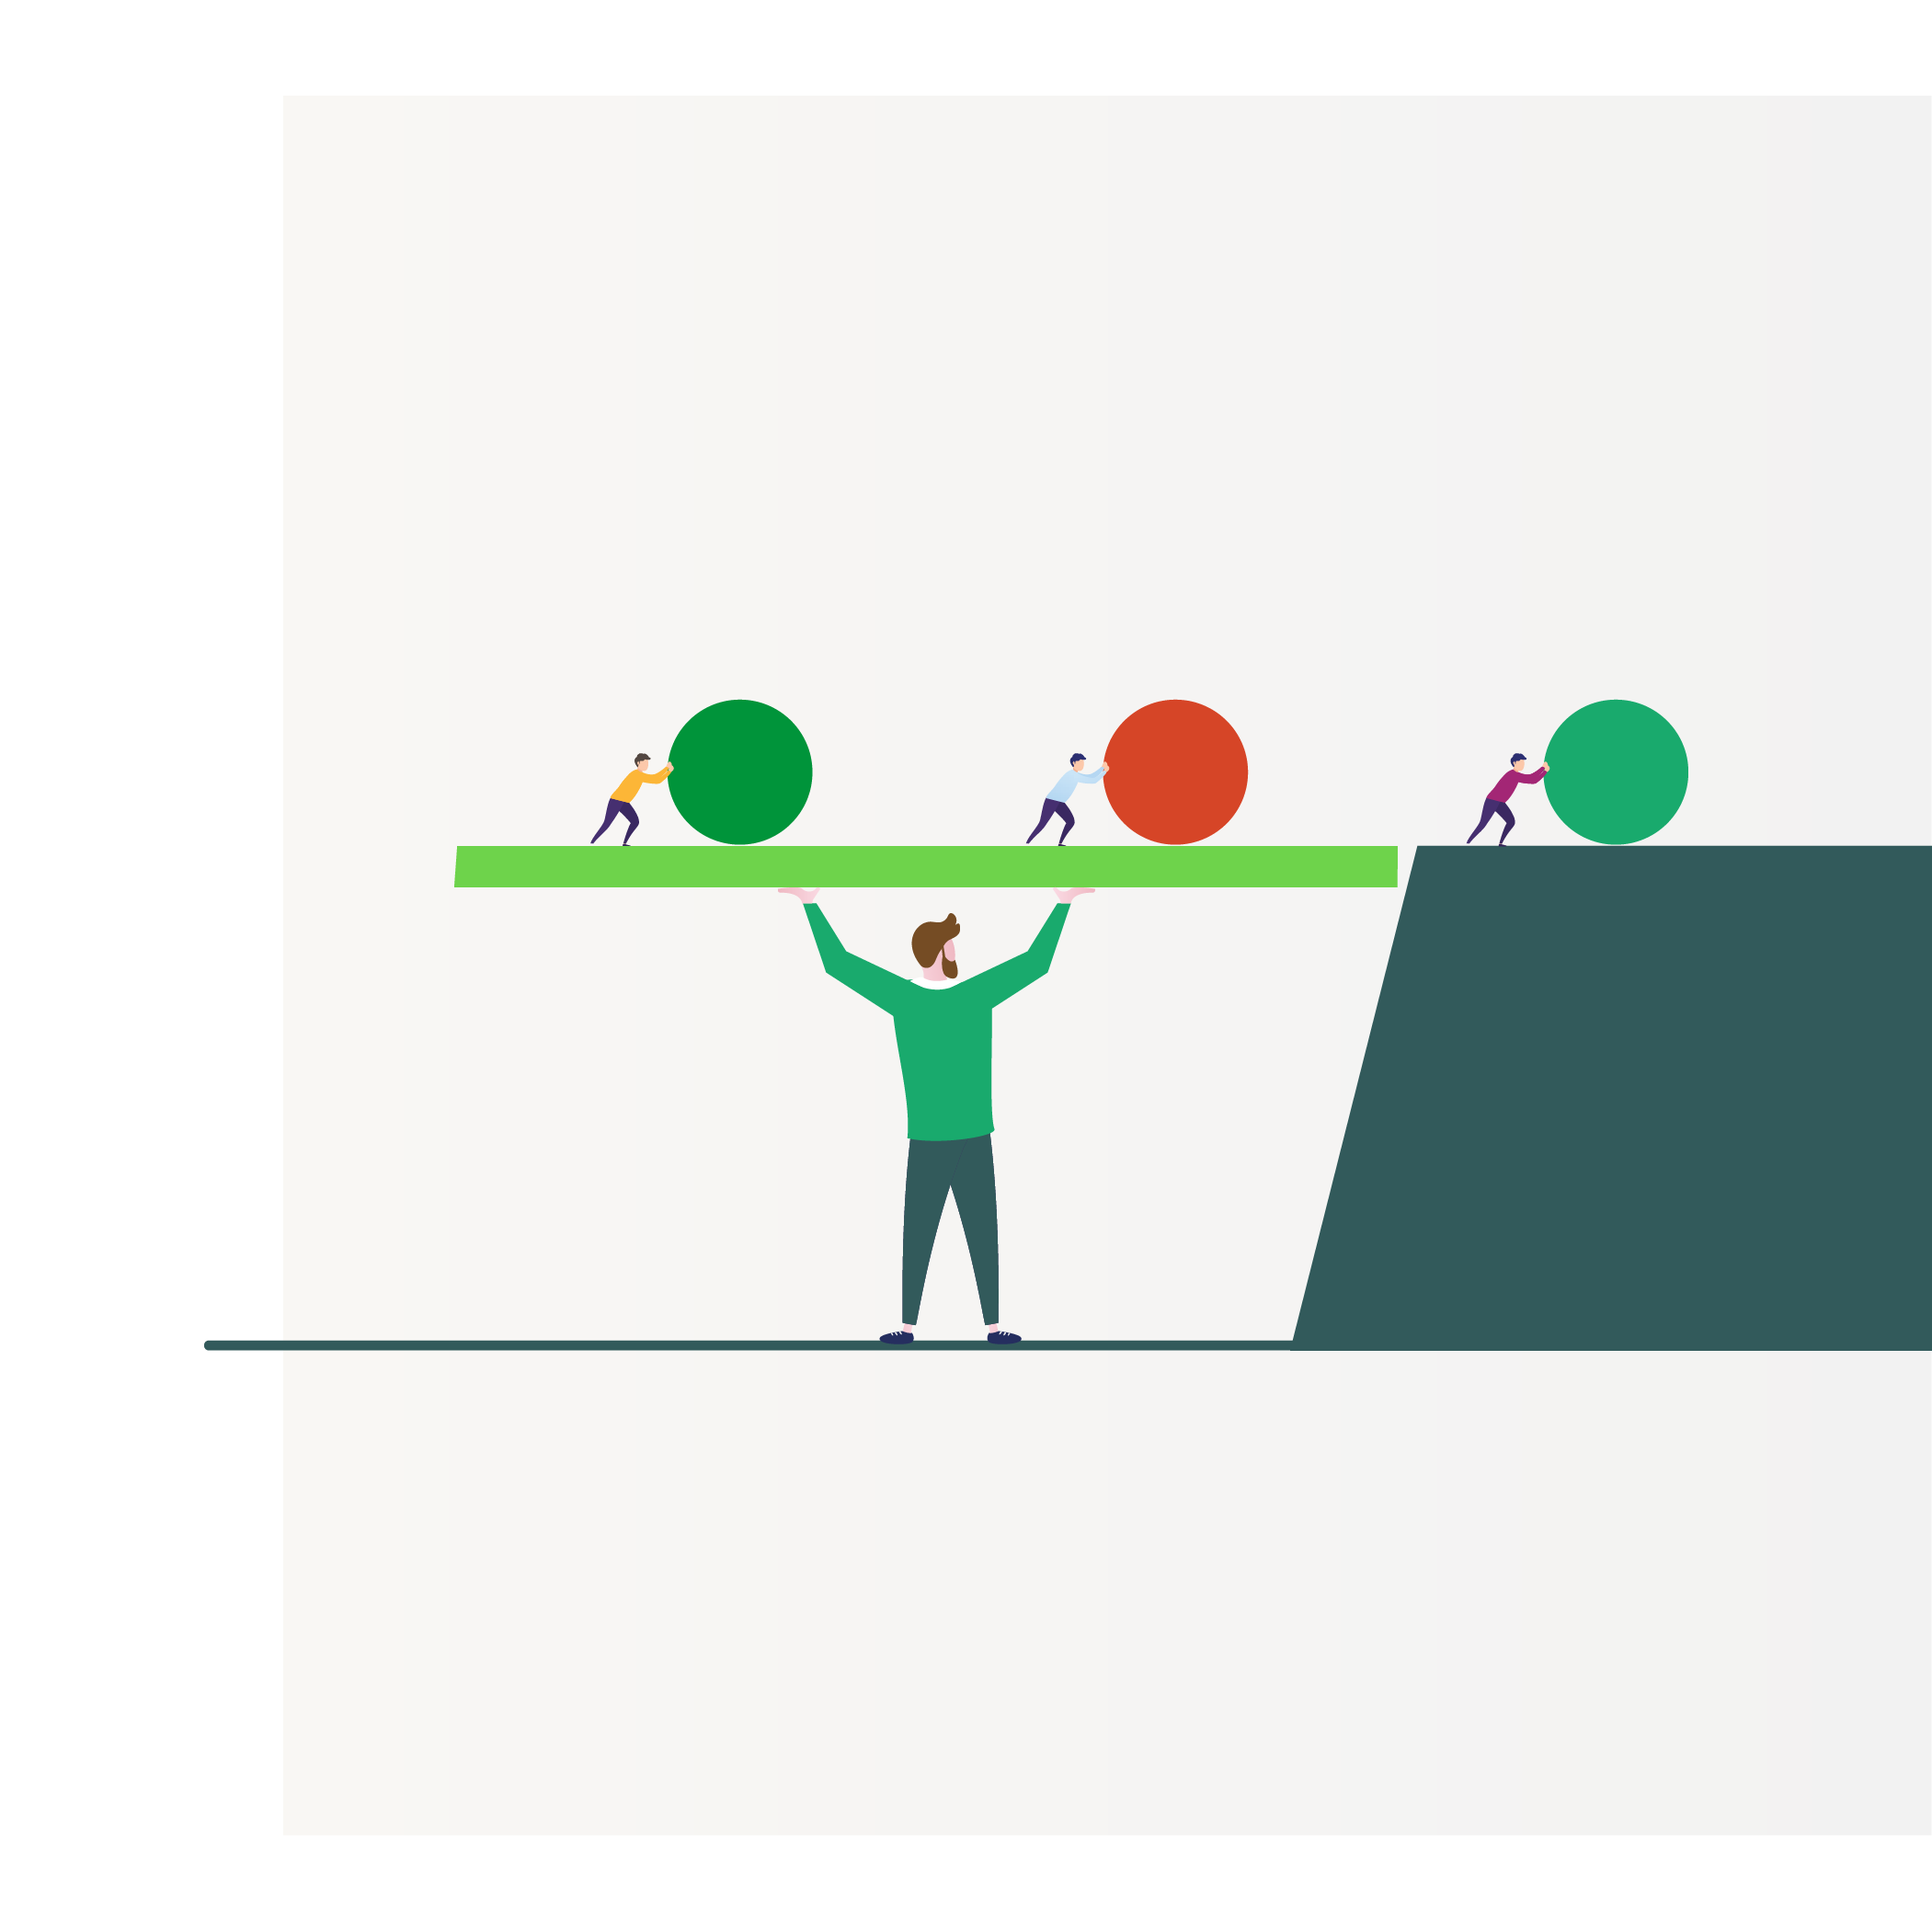 Turnaround Management illustration